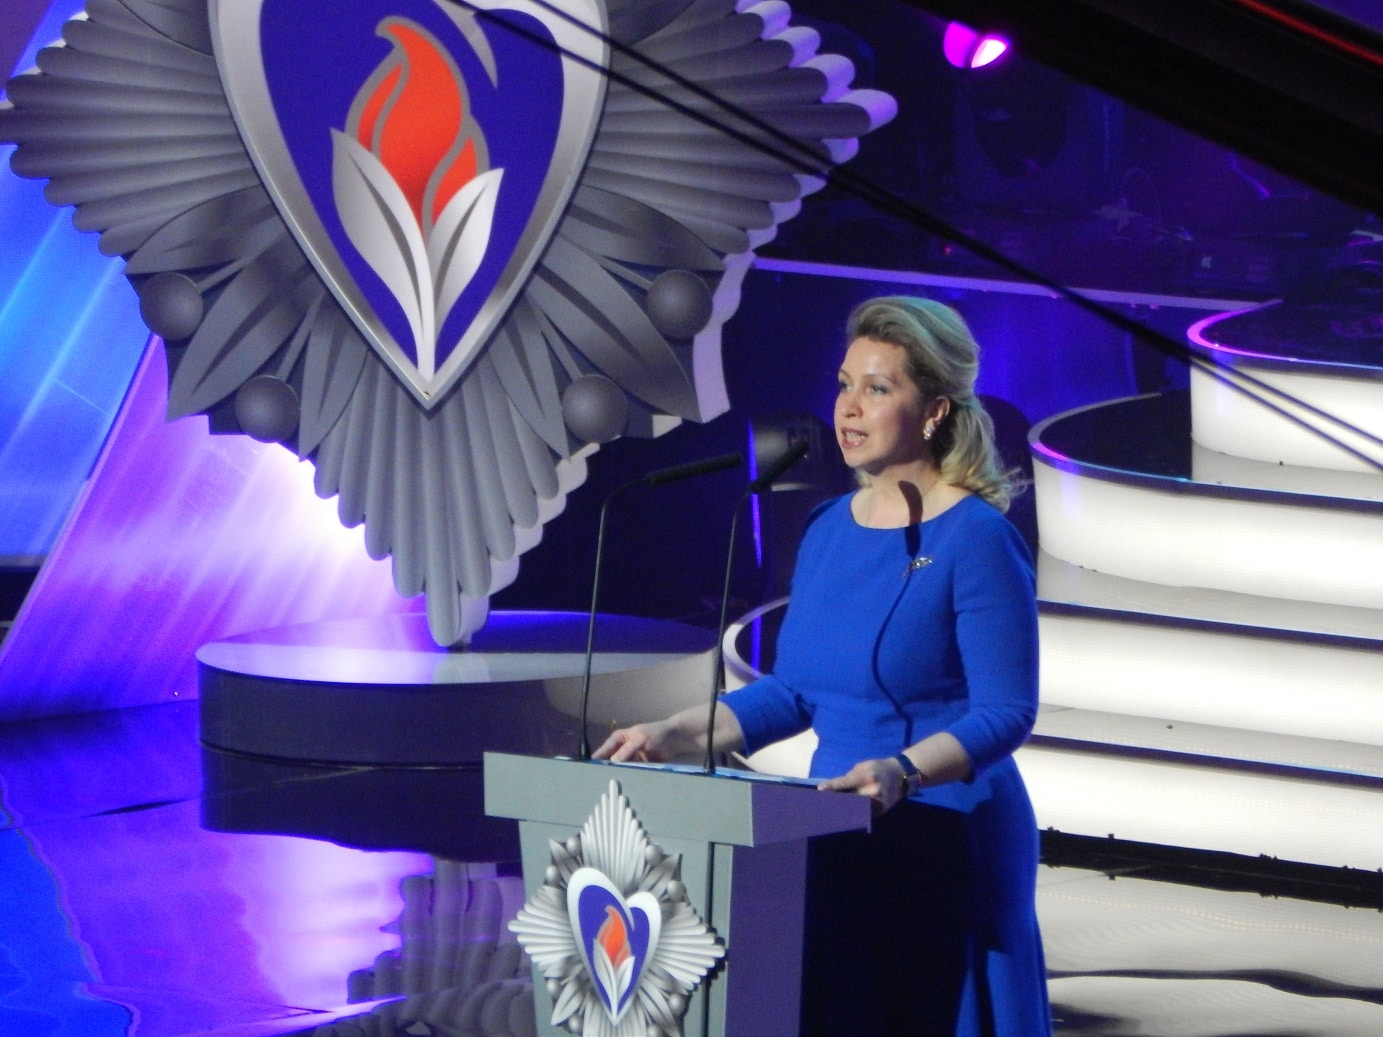 Светлана Владимировна Медведева